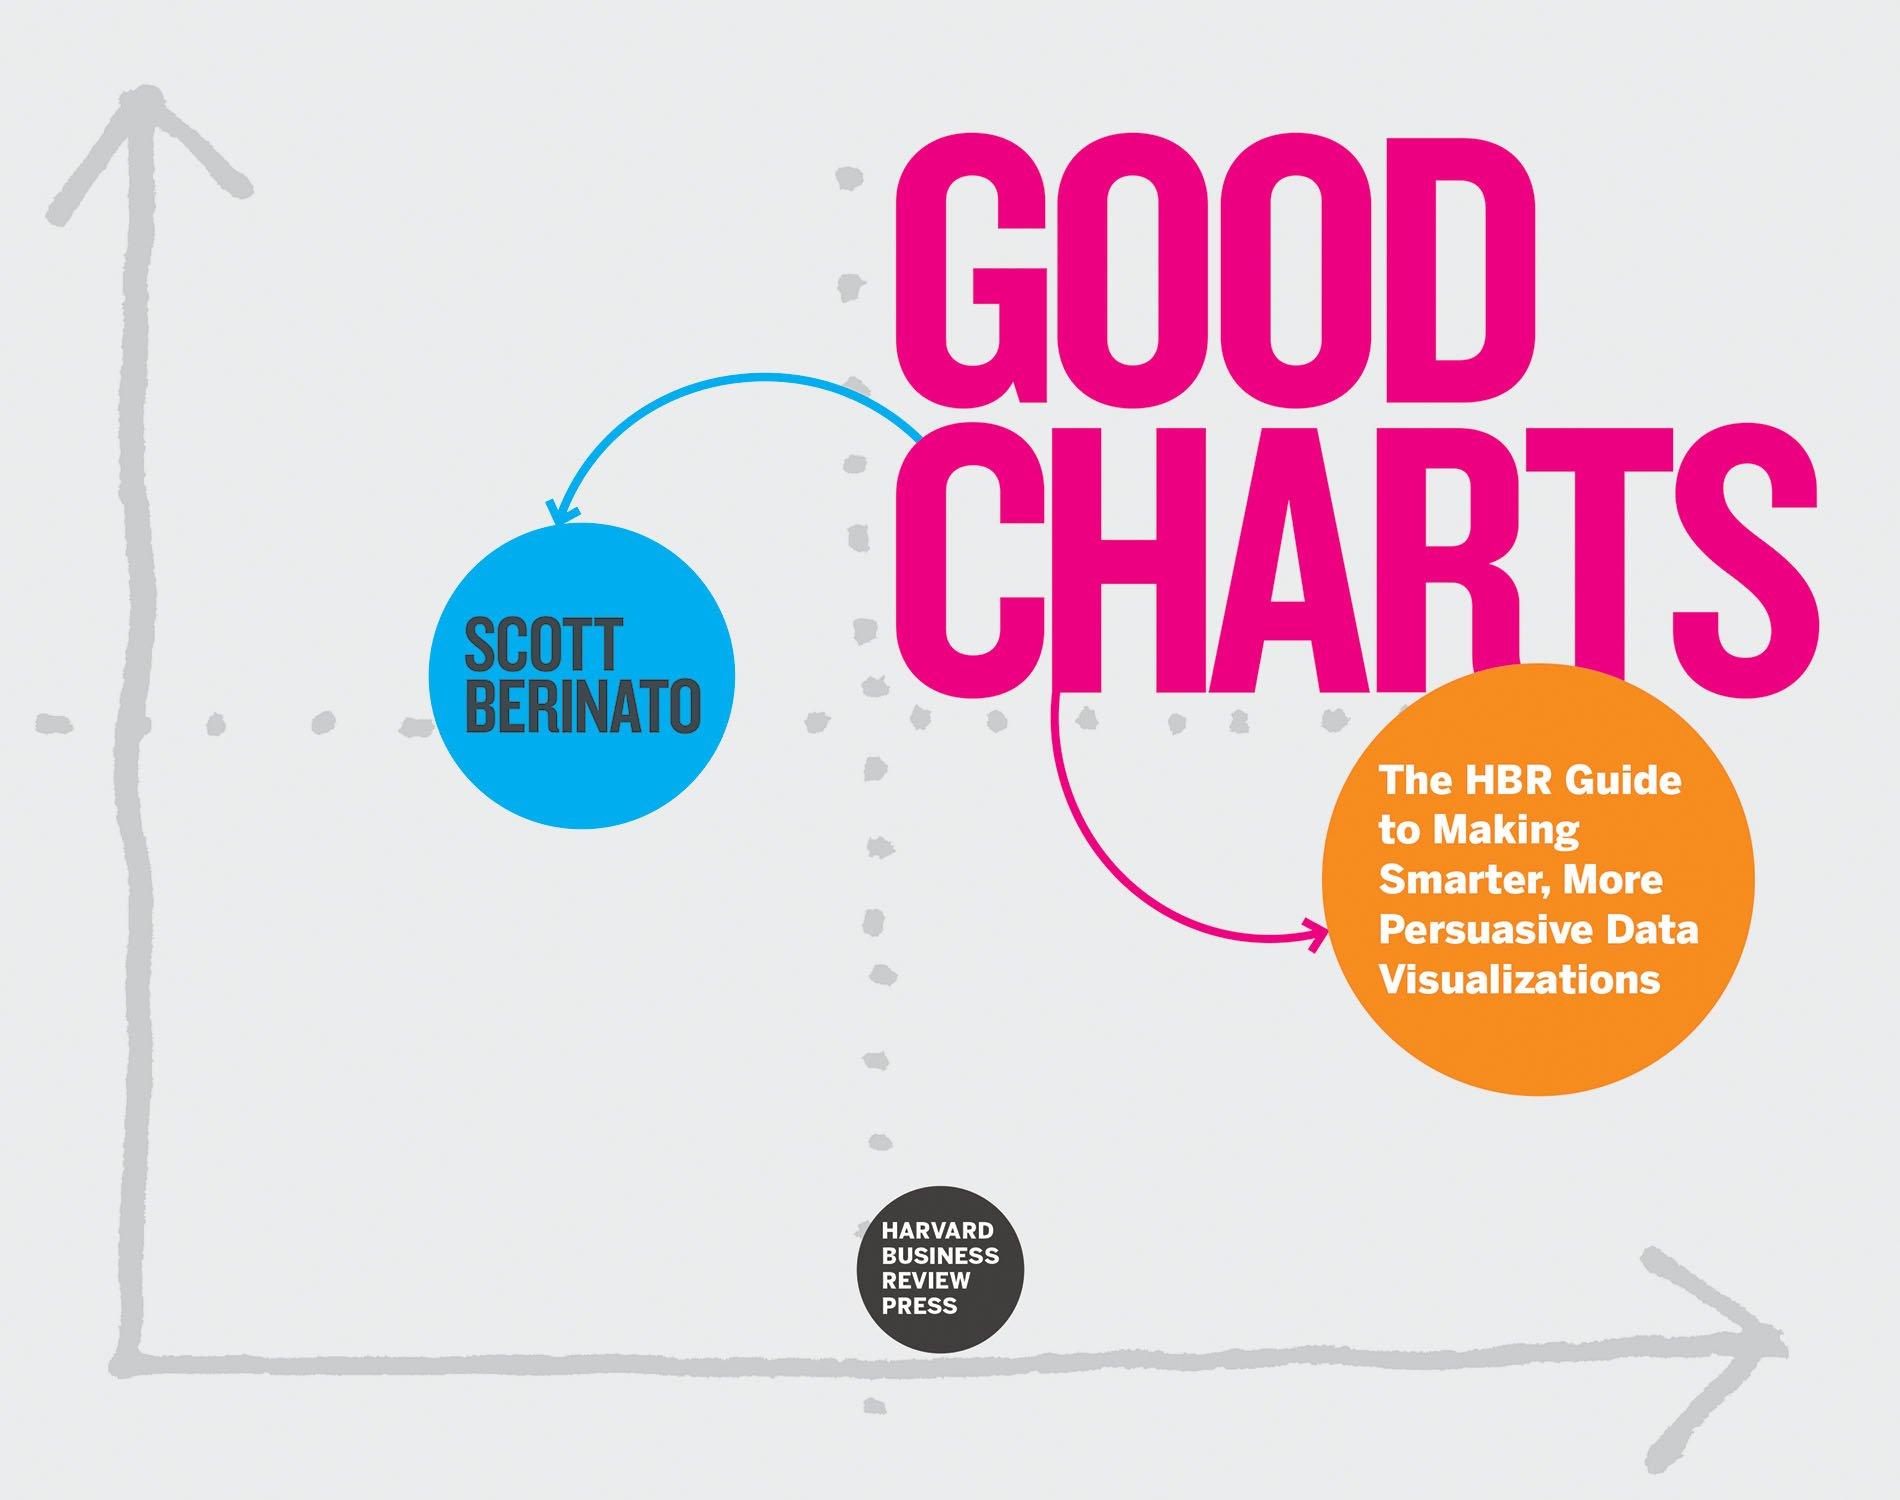 Good Charts by Scott Berinato